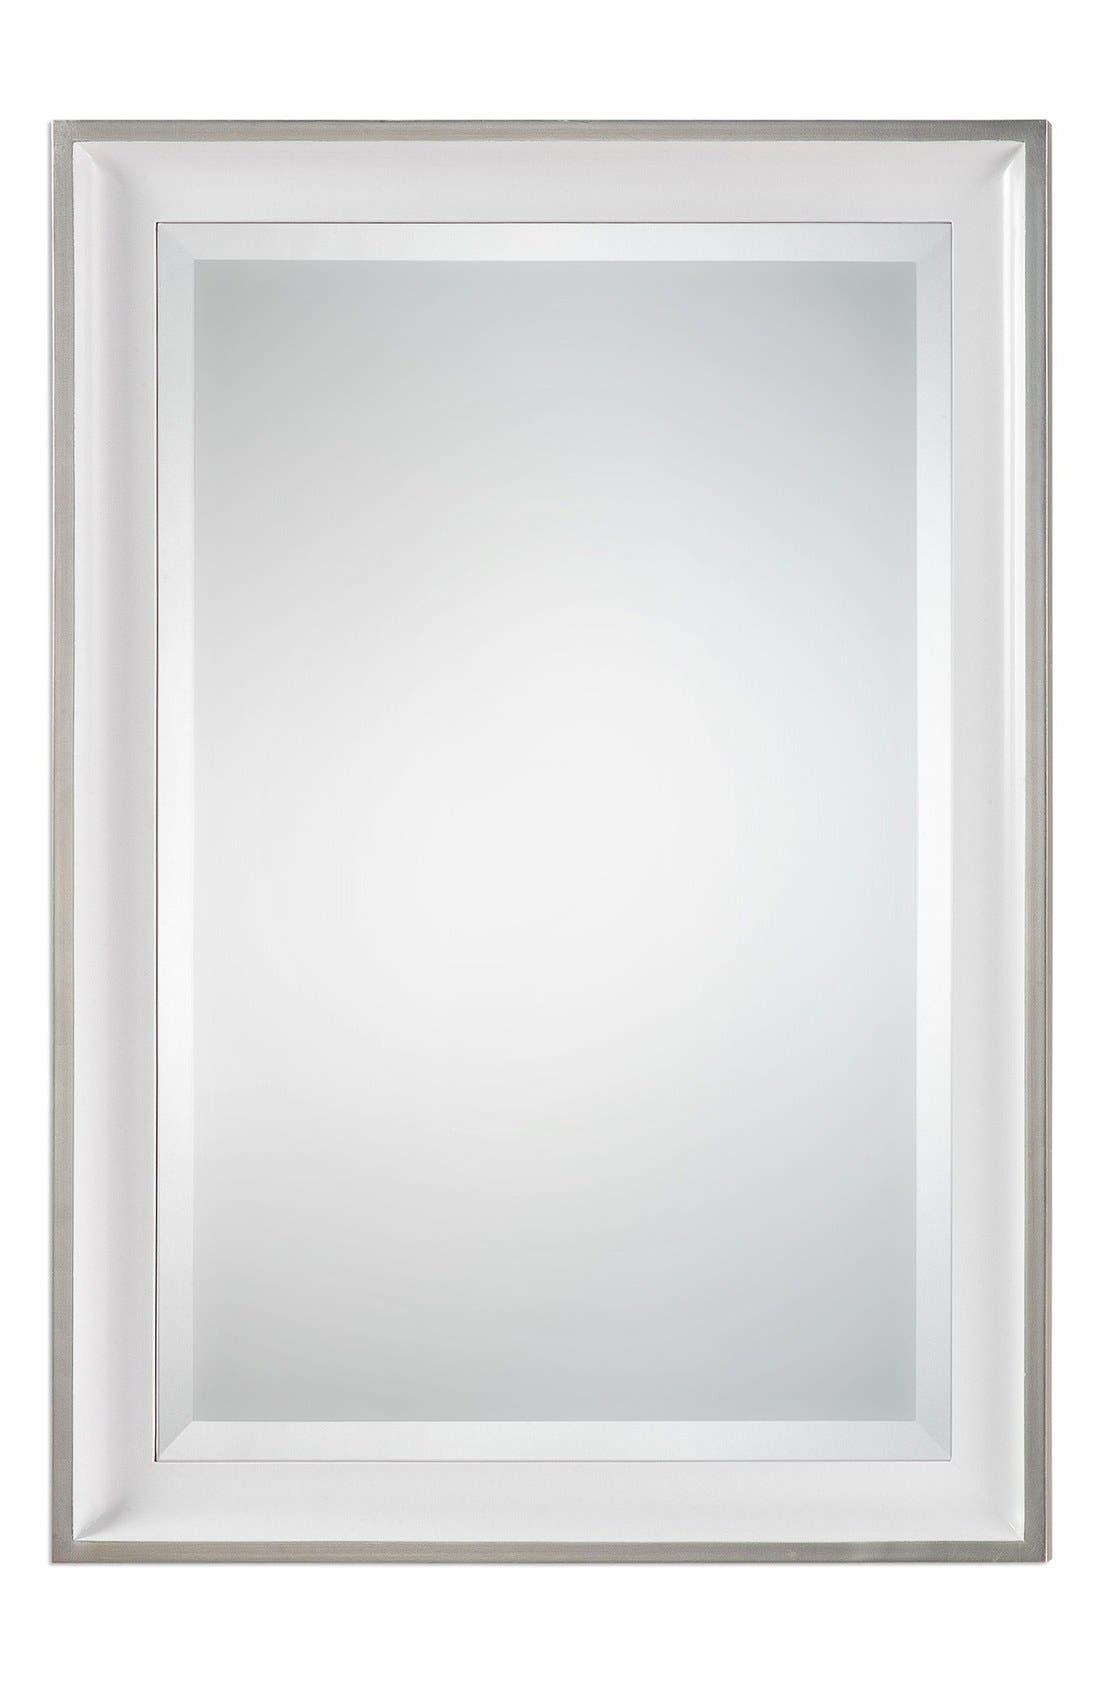 Alternate Image 1 Selected - Uttermost 'Lahvahn' Mirror